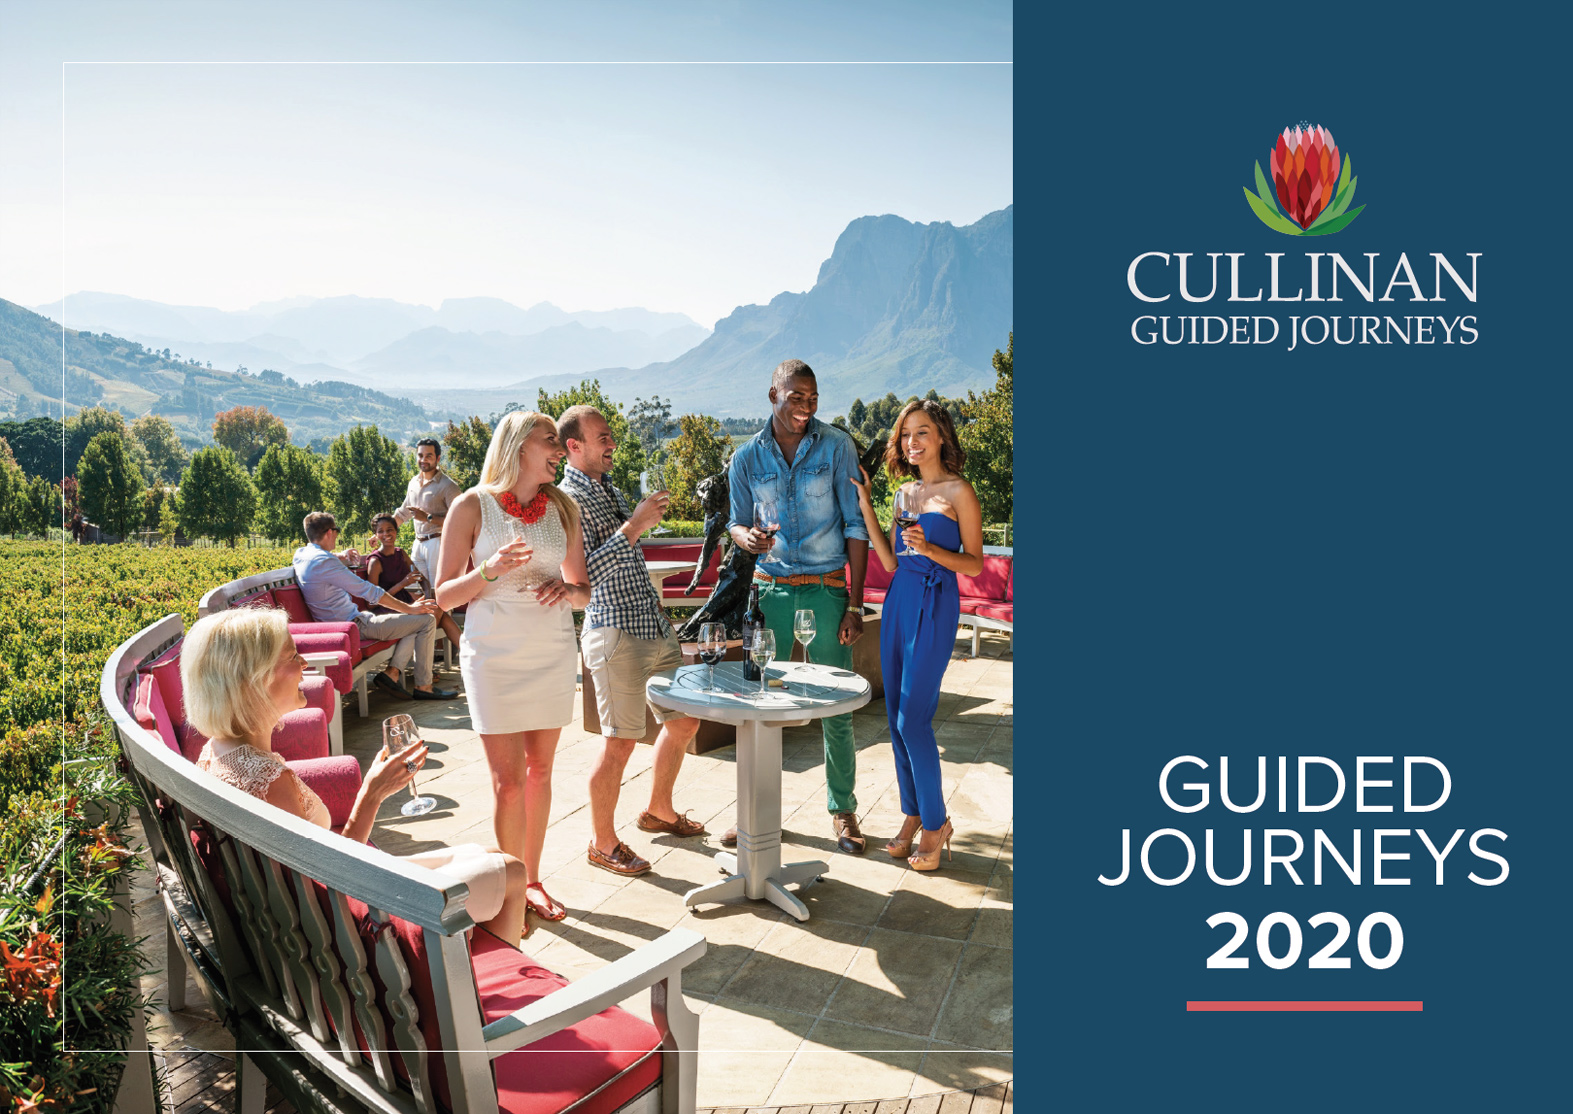 Cullinan Guided Journeys 2020 Brochure